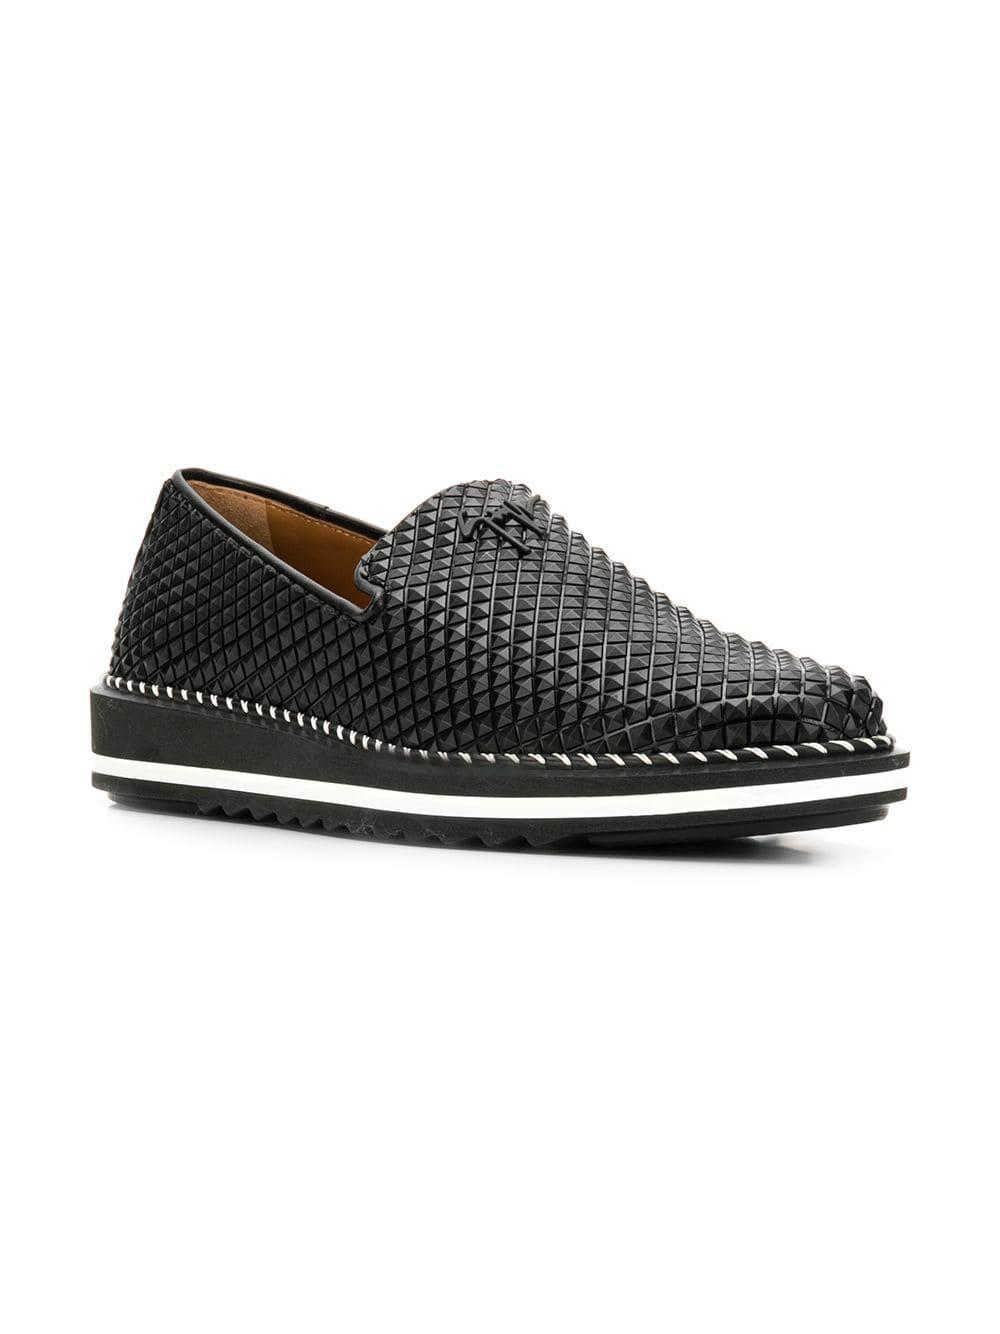 5d1f2661d3ea9 Lyst - Giuseppe Zanotti Pyramid Stud Loafers in Black for Men